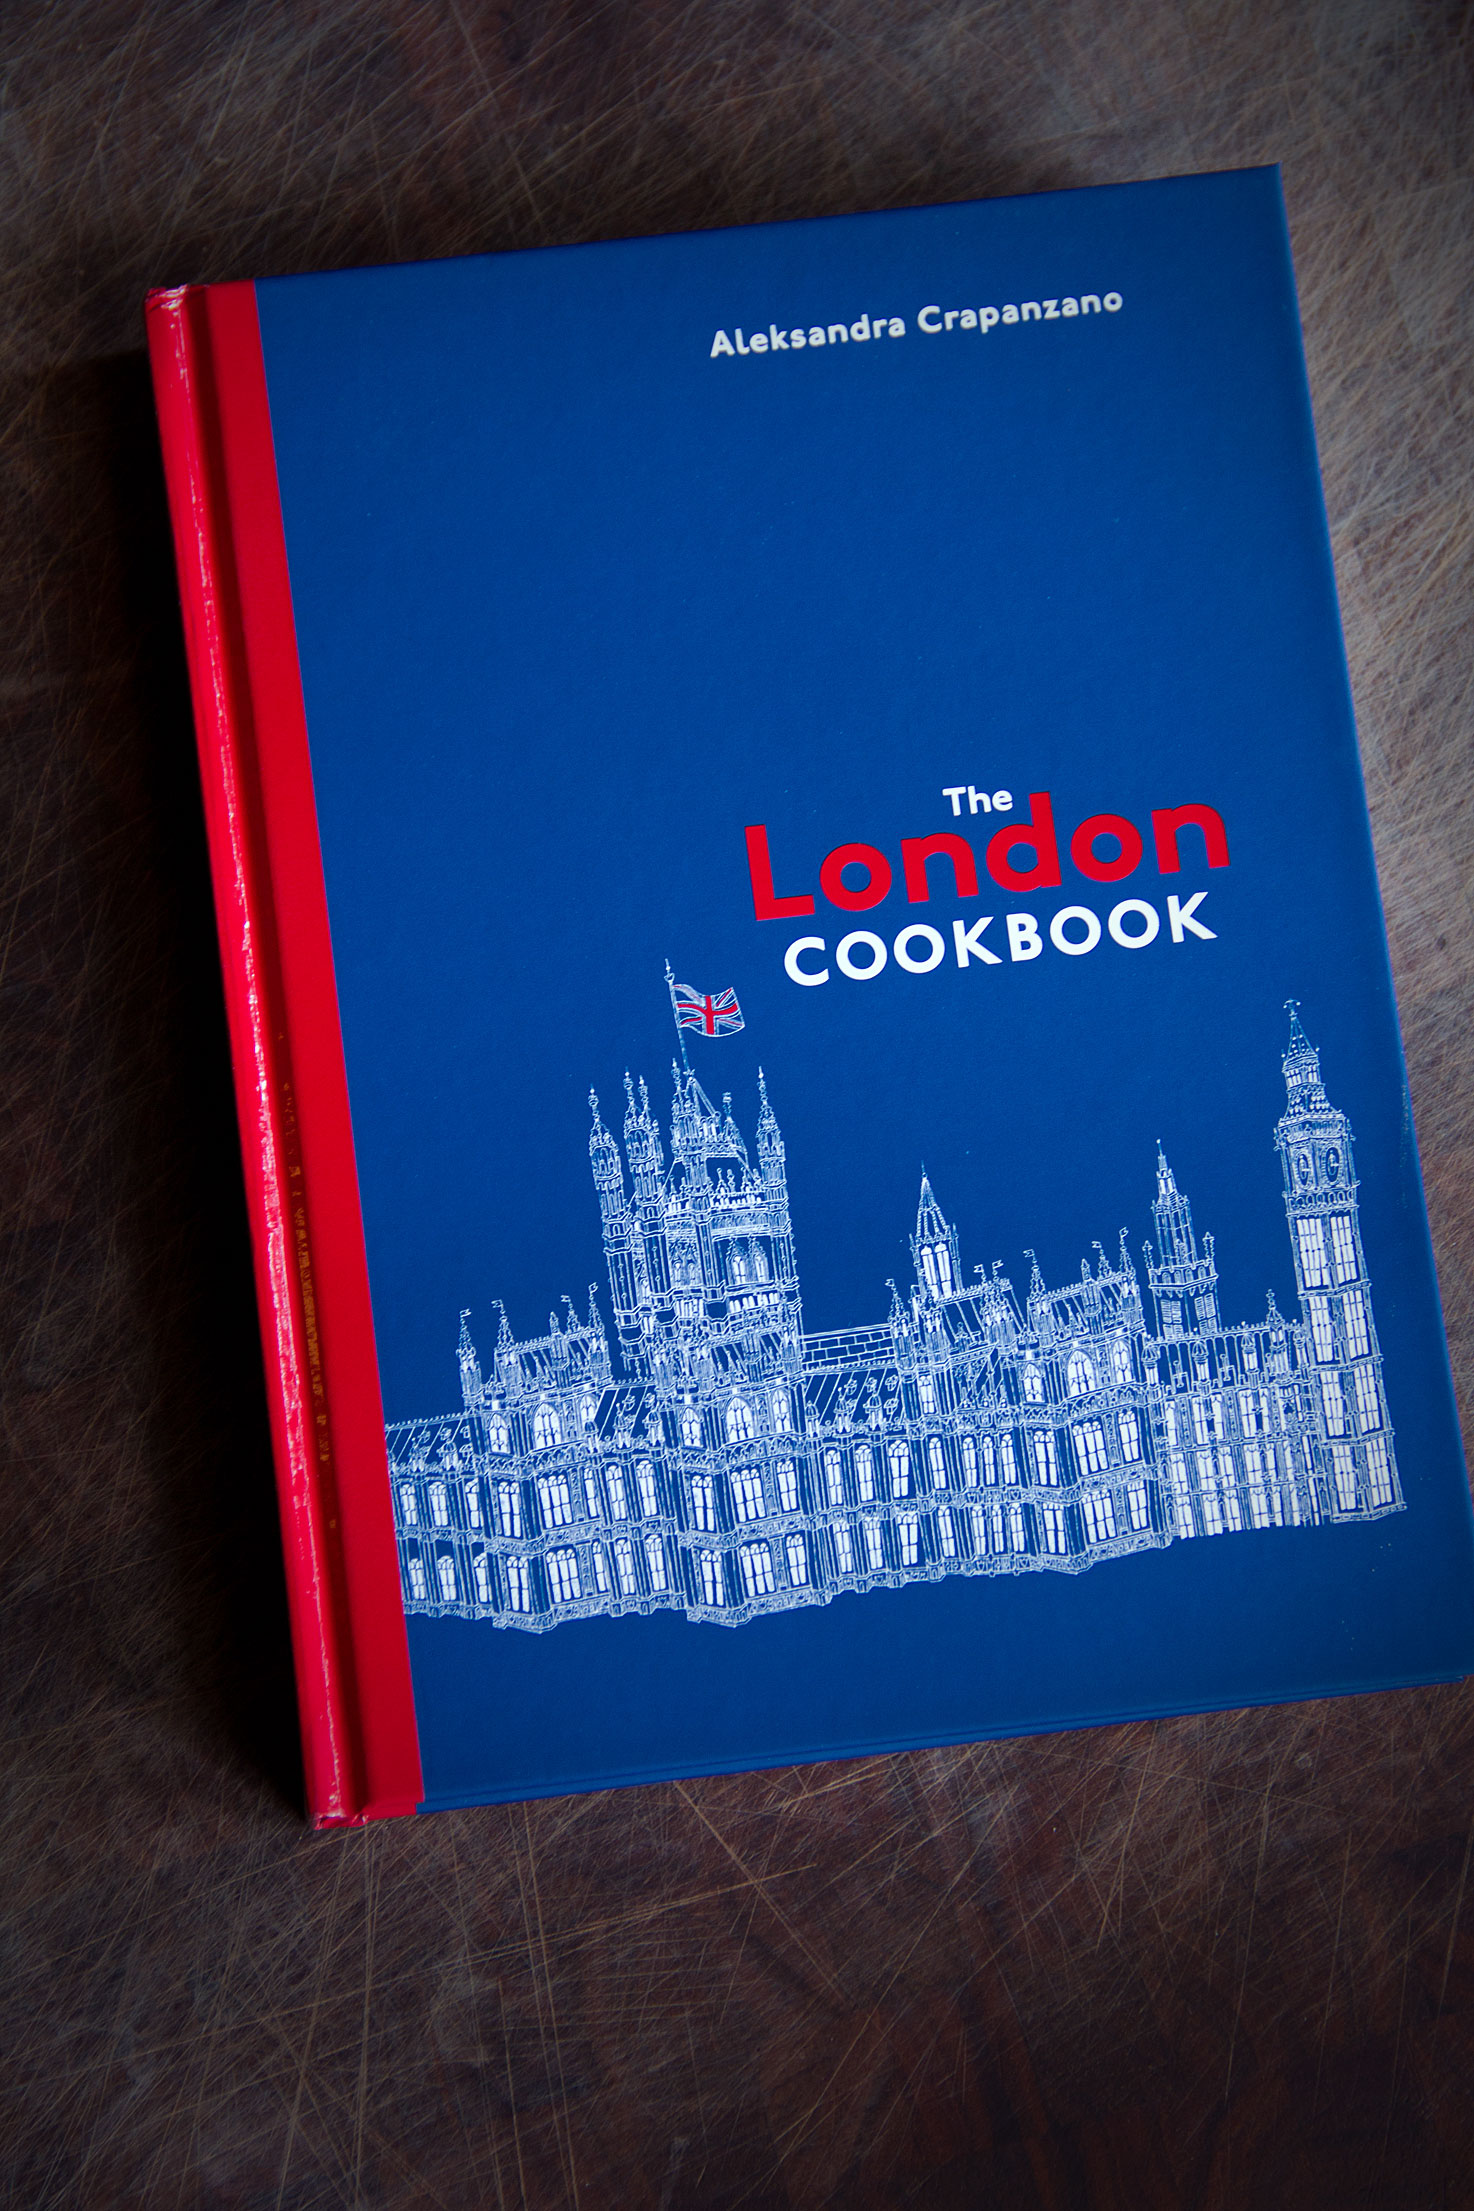 The London Cookbook: By Aleksandra Crapanzano